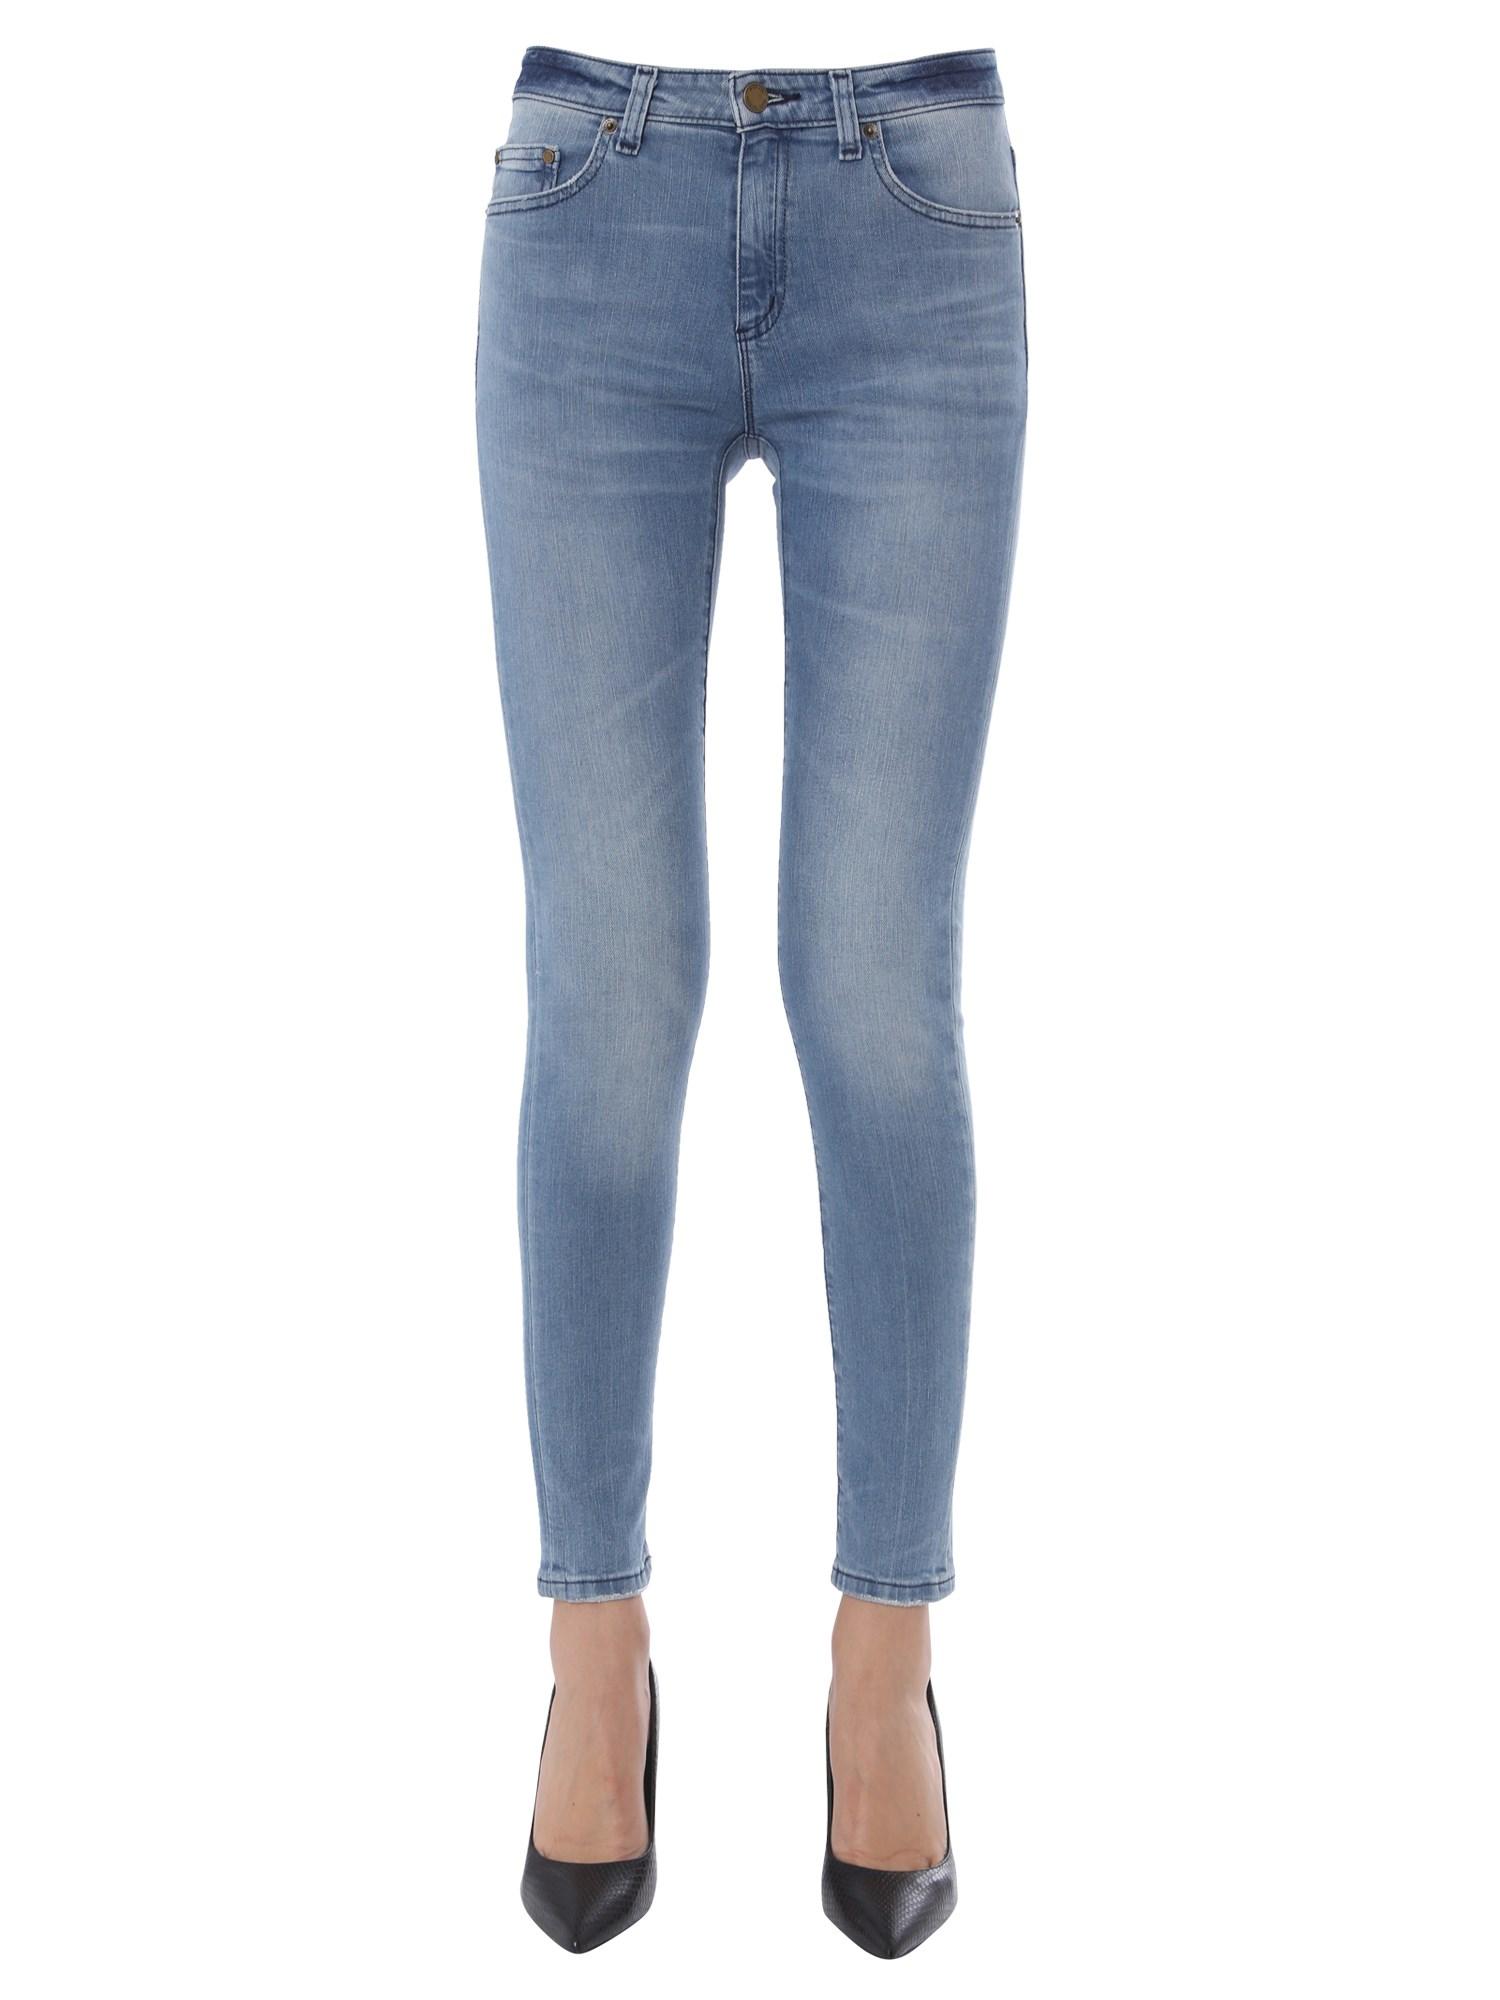 Skinny fit jeans - michael by michael kors - Modalova